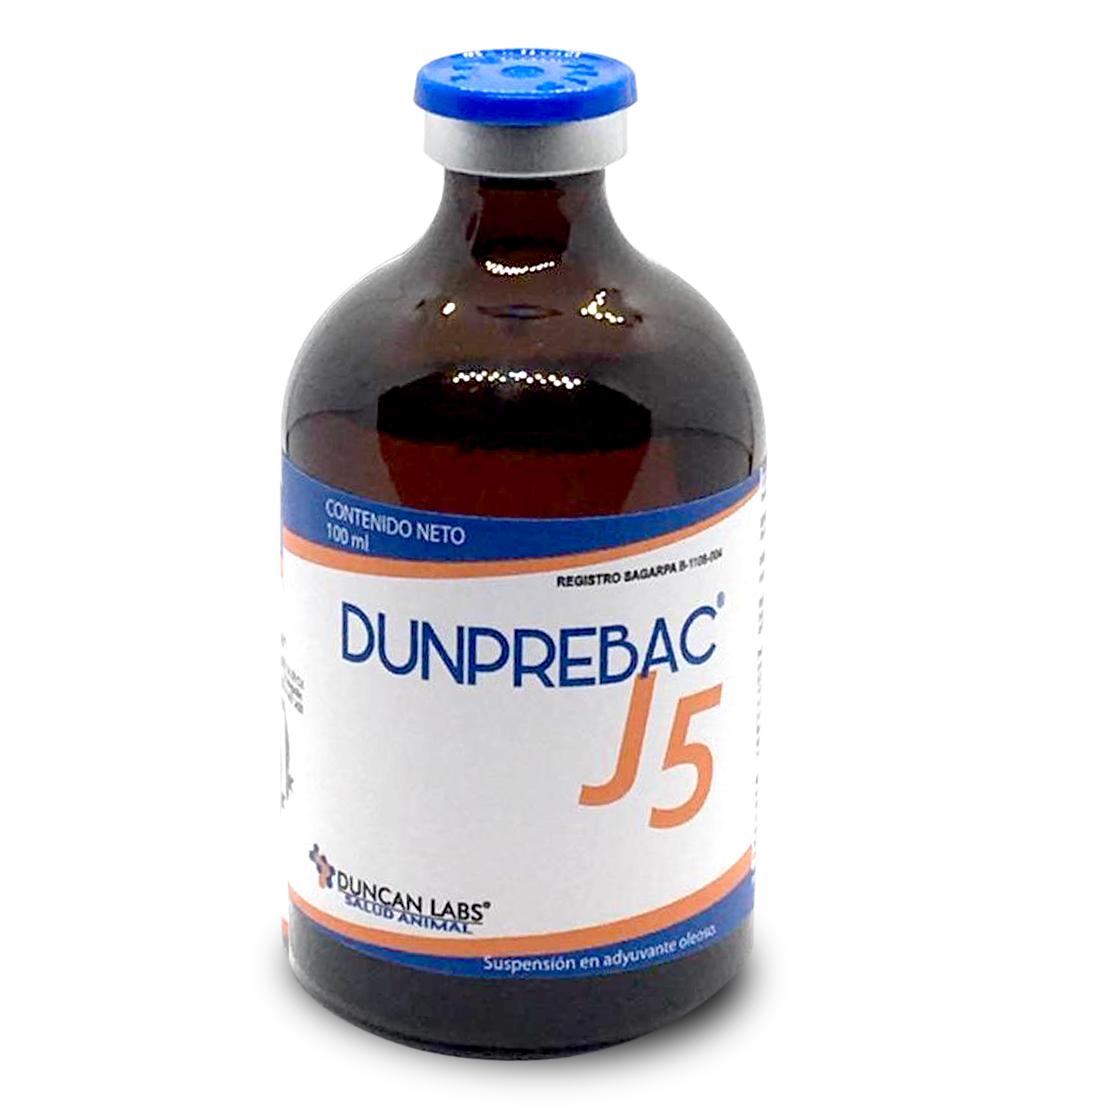 DUNPREBAC J5